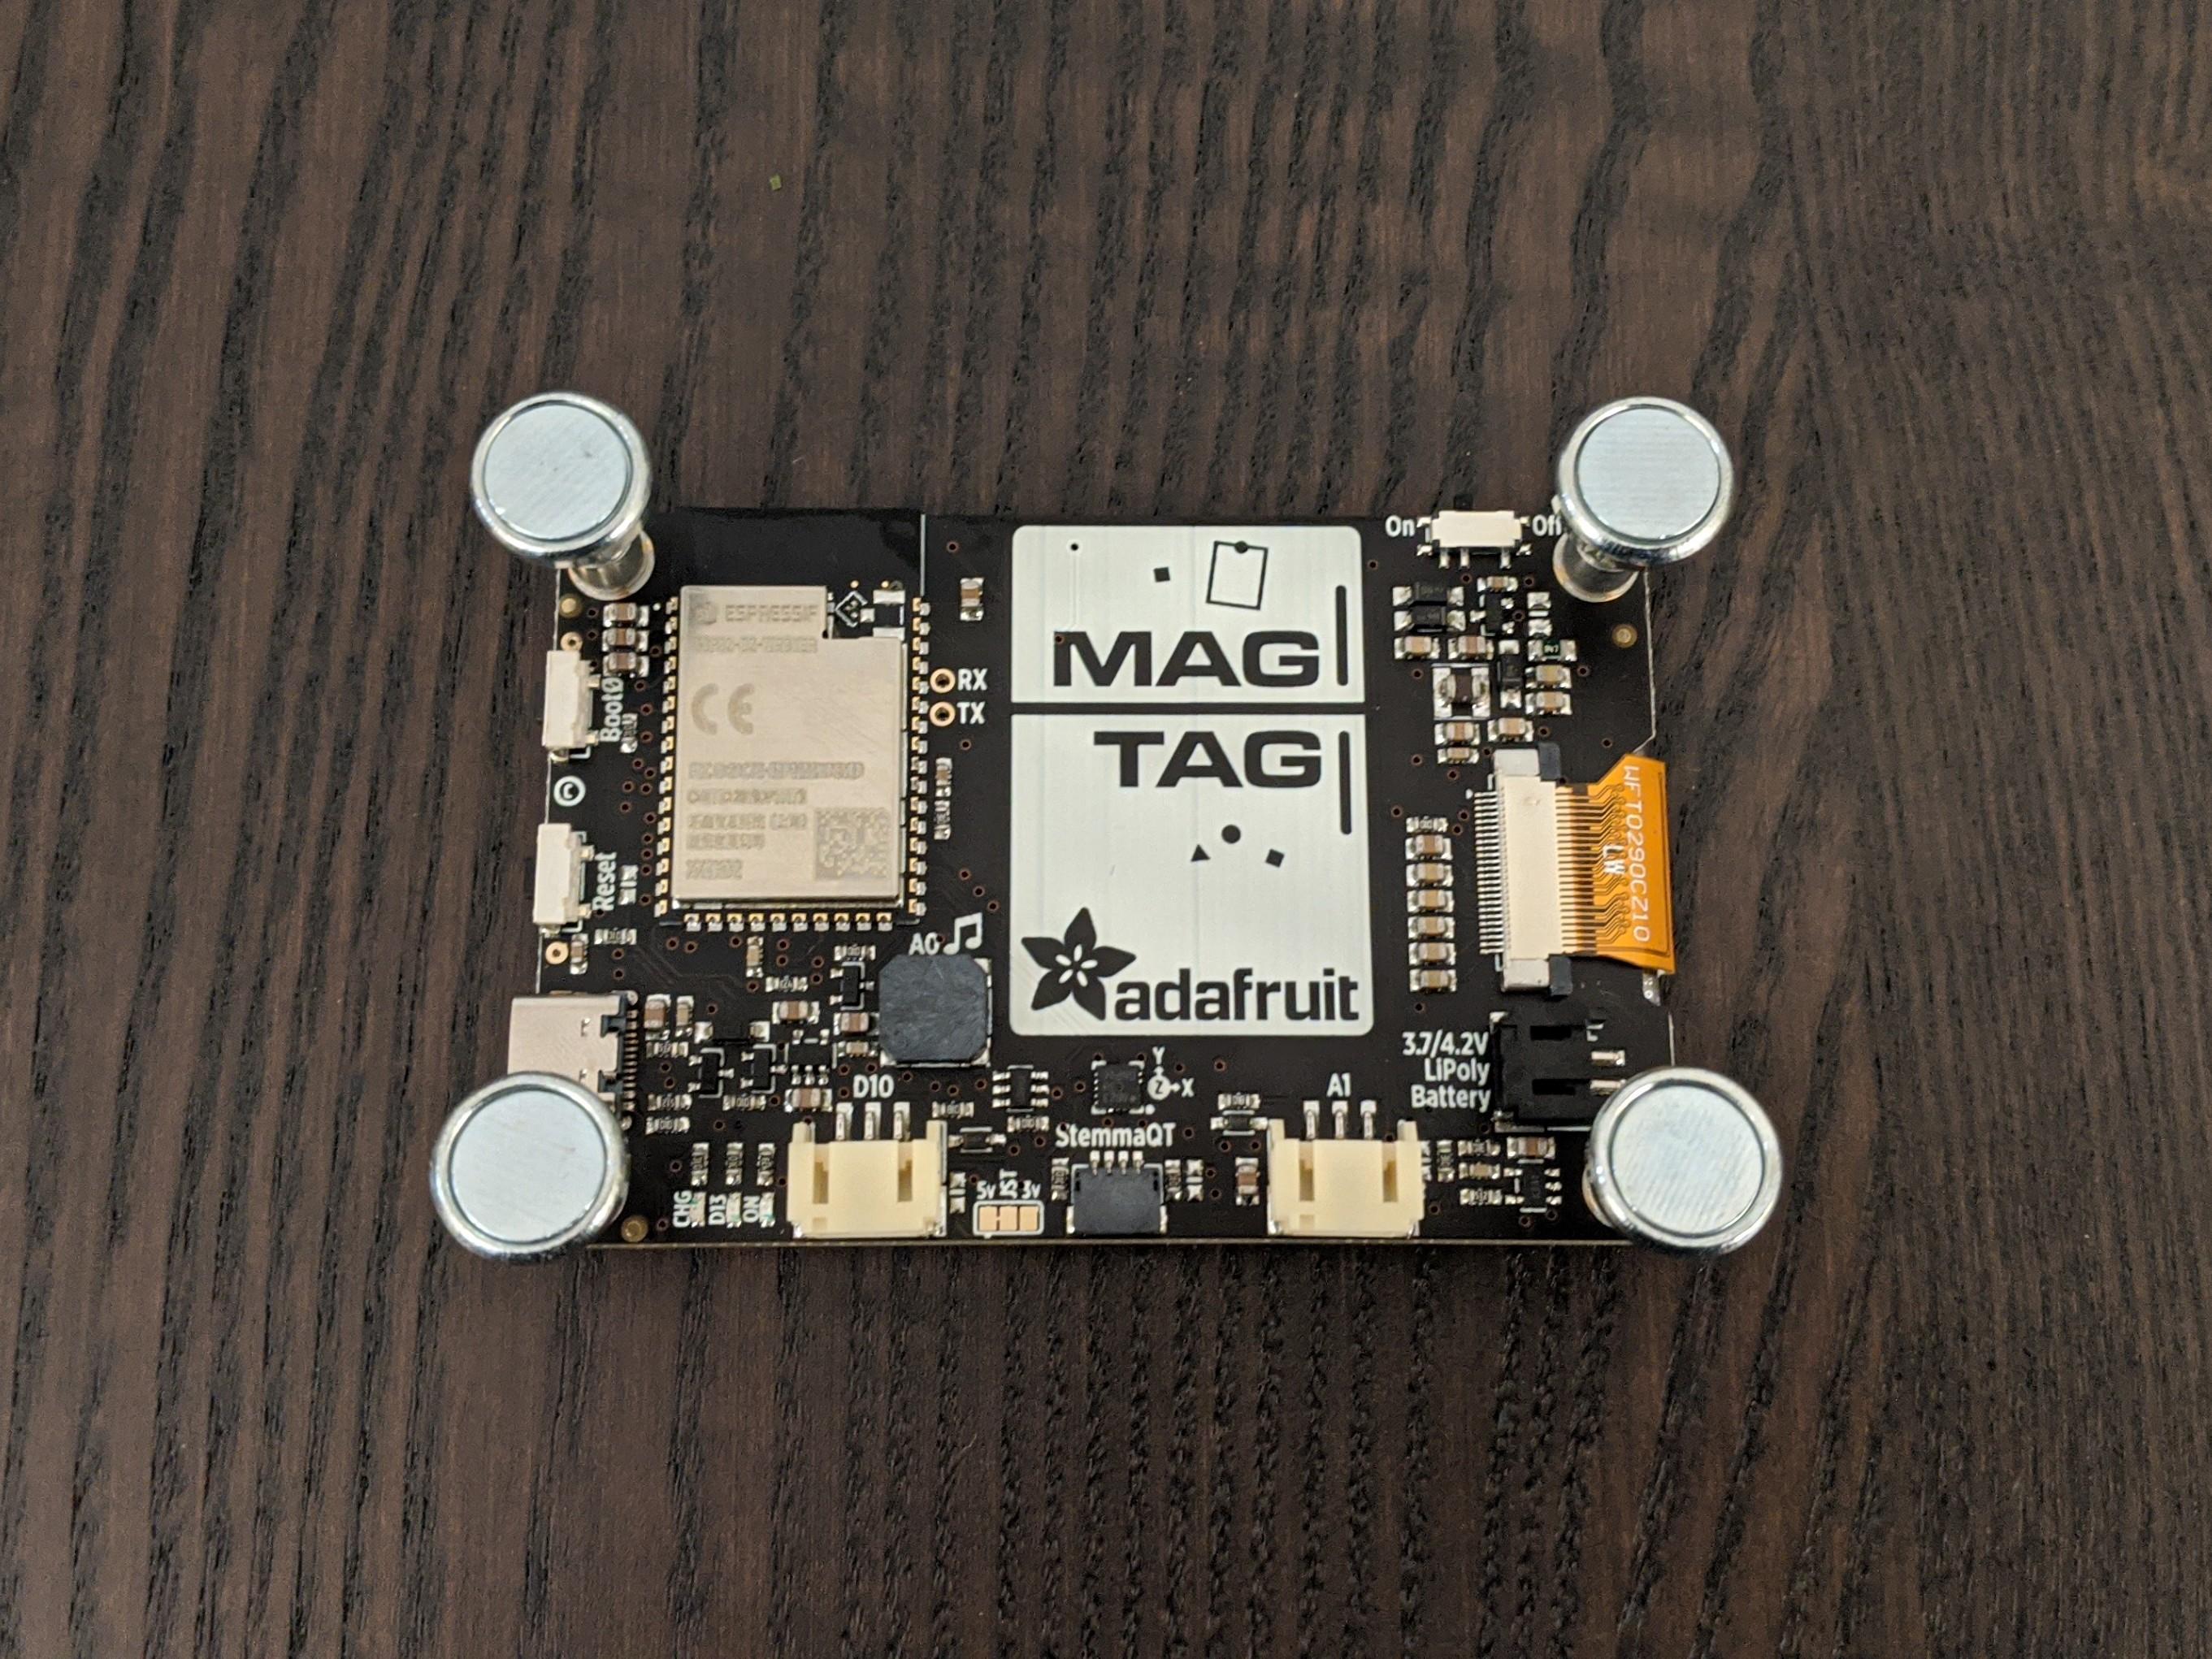 led_strips_MagTag_LED_feet_assembled.jpg